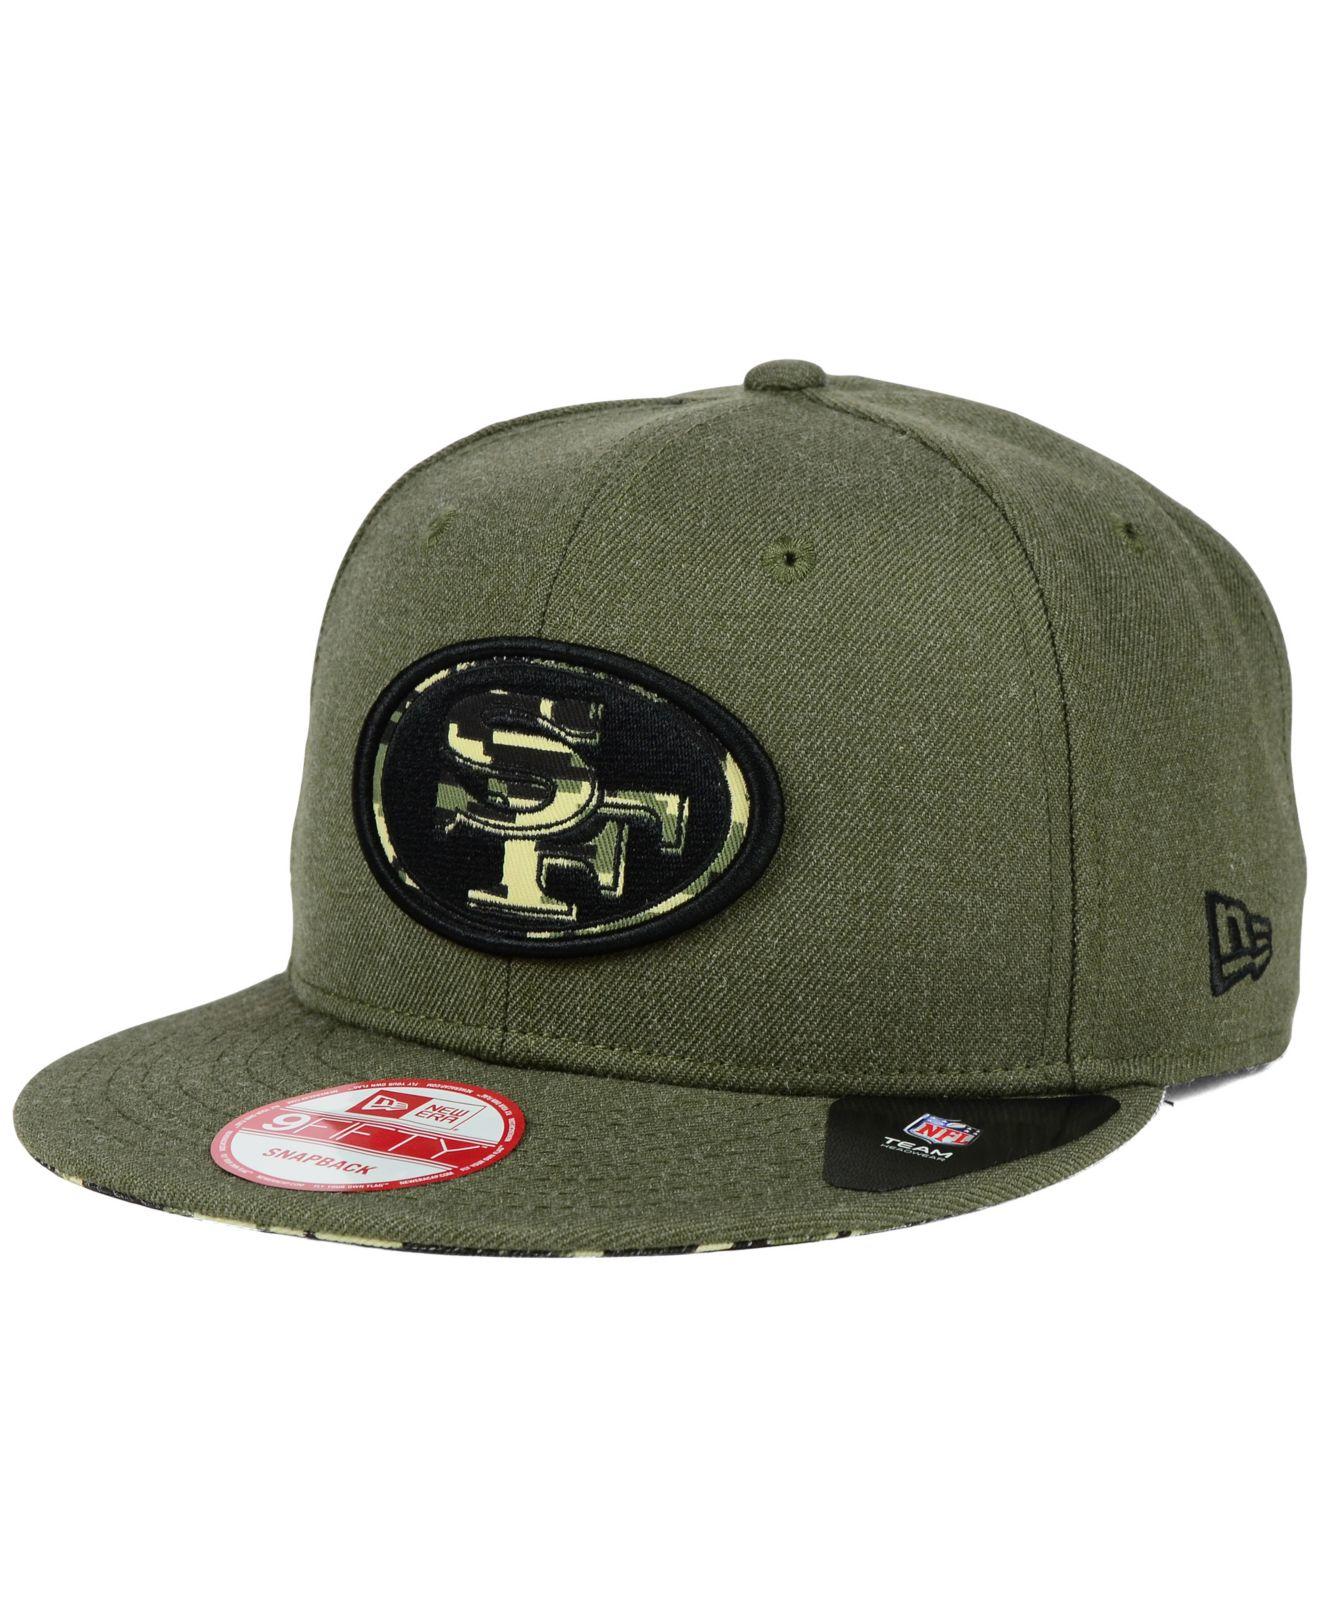 0667ff580 ebay san francisco 49ers new era nfl heather pop 9fifty snapback cap ...